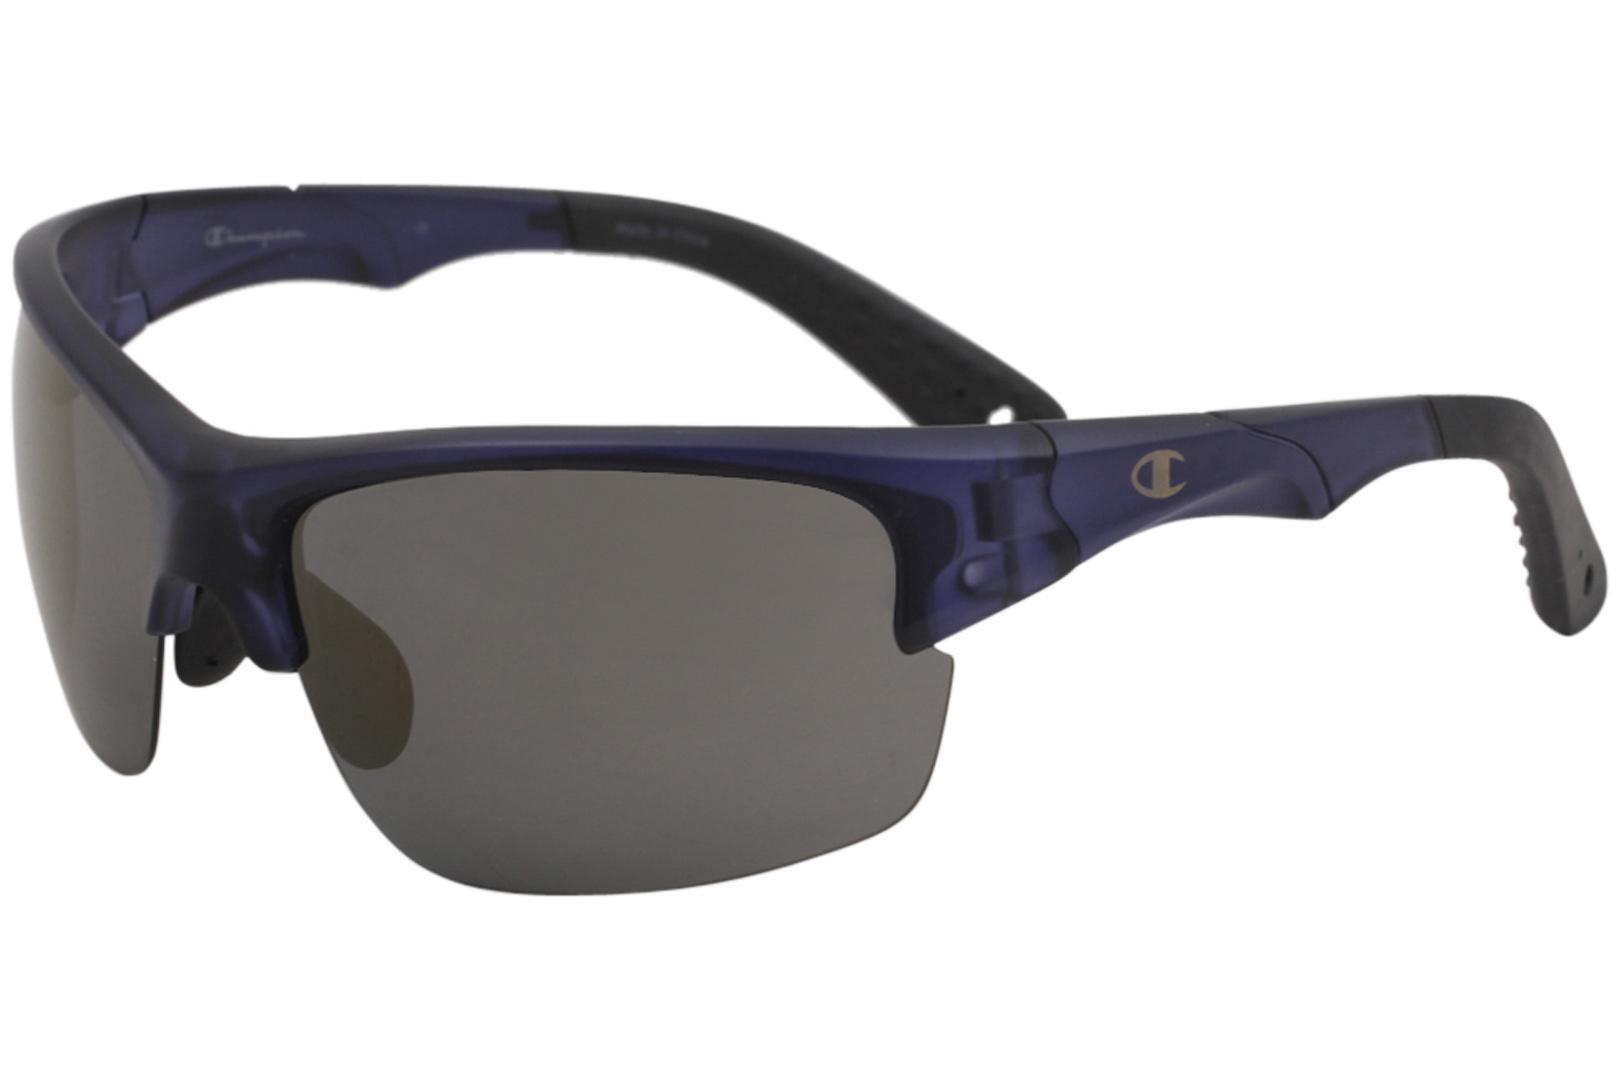 f2f8609478c Champion Men s CU5095 CU 5095 Sport Wrap Sunglasses by Champion. Hover to  zoom